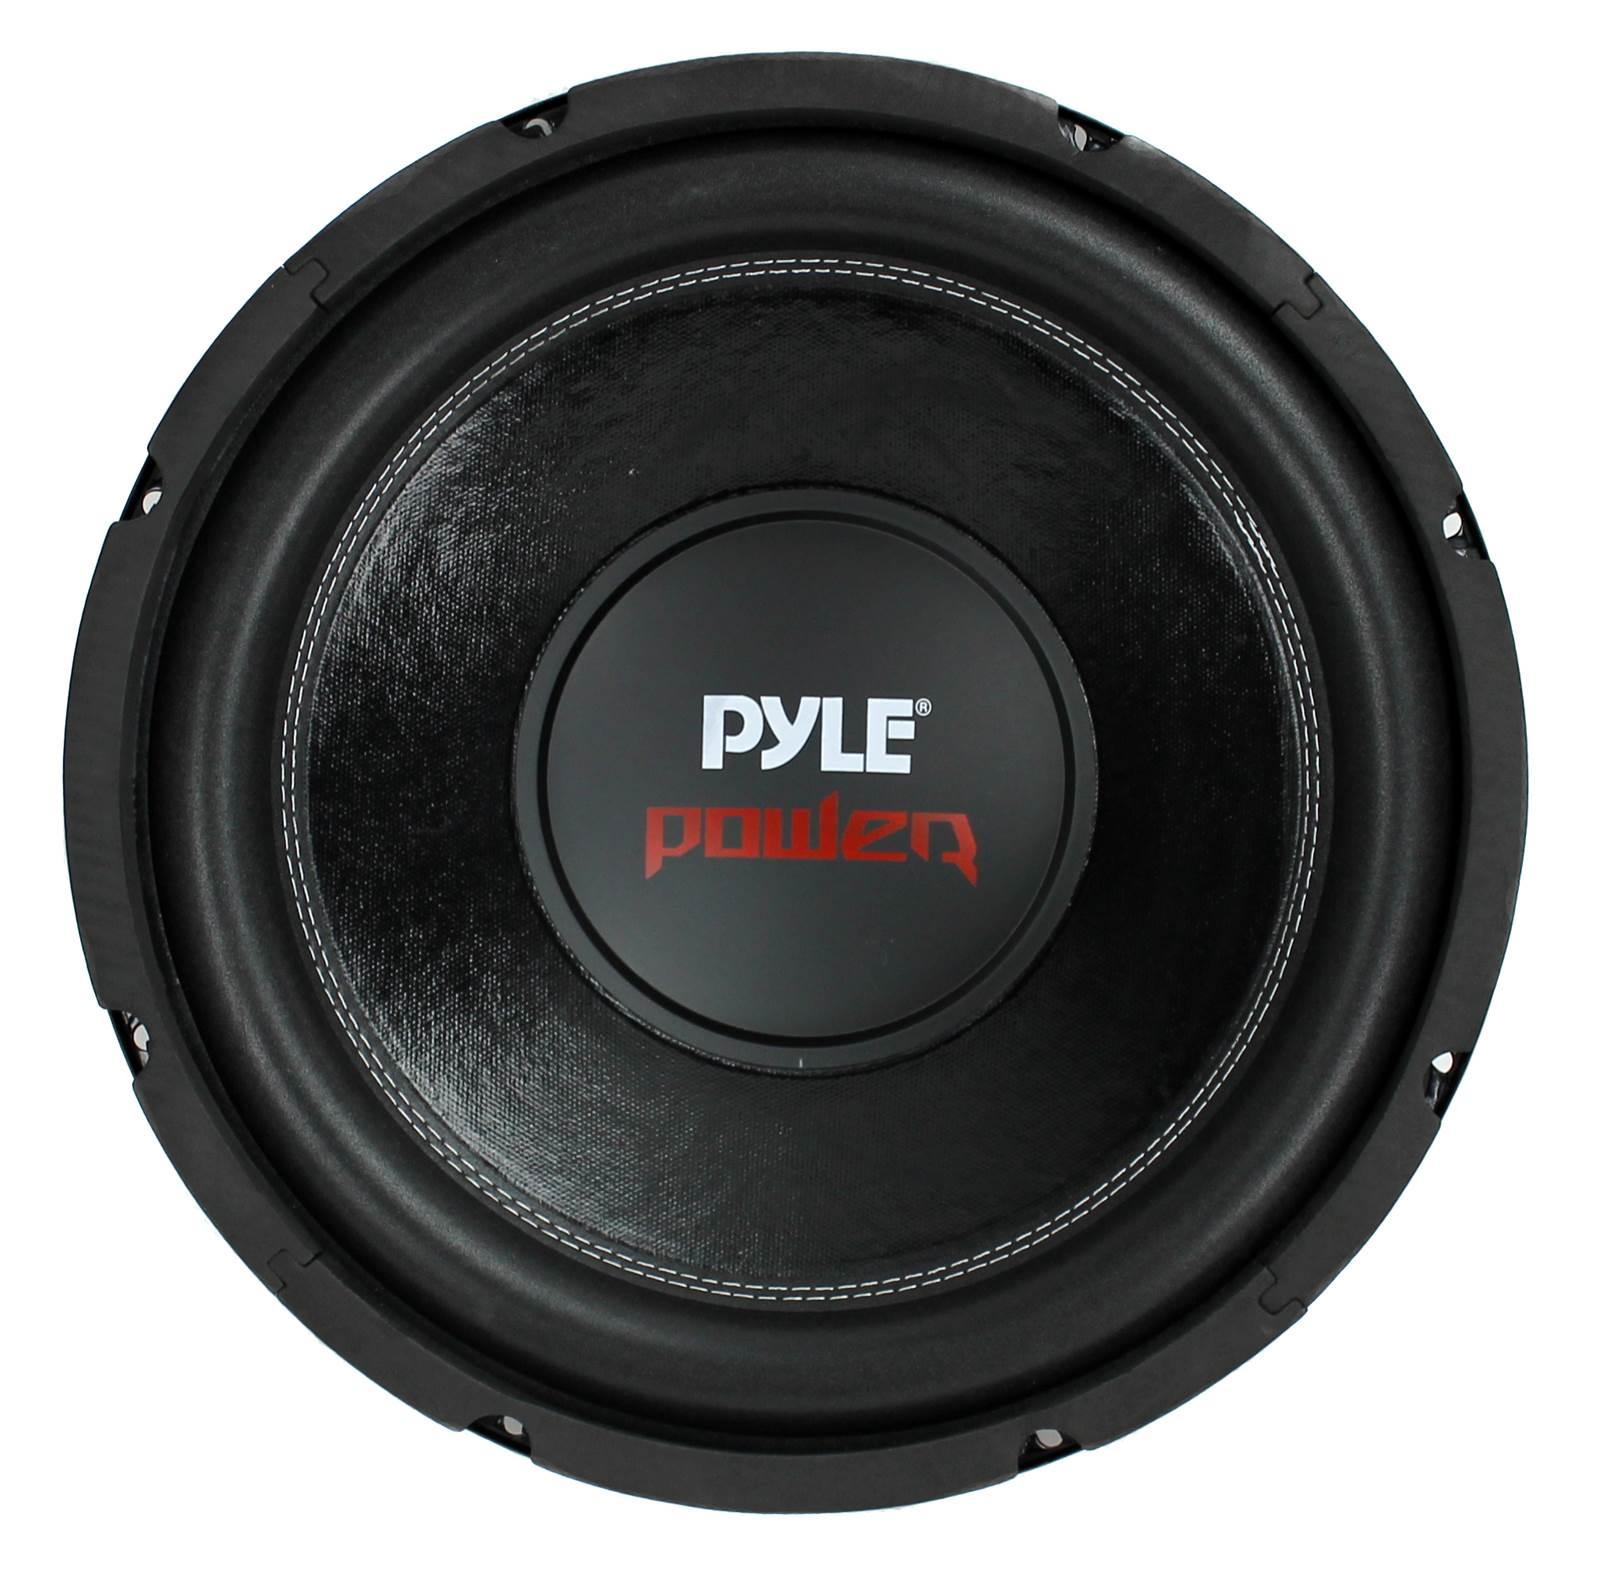 PYLE-12-inch-Subwoofer